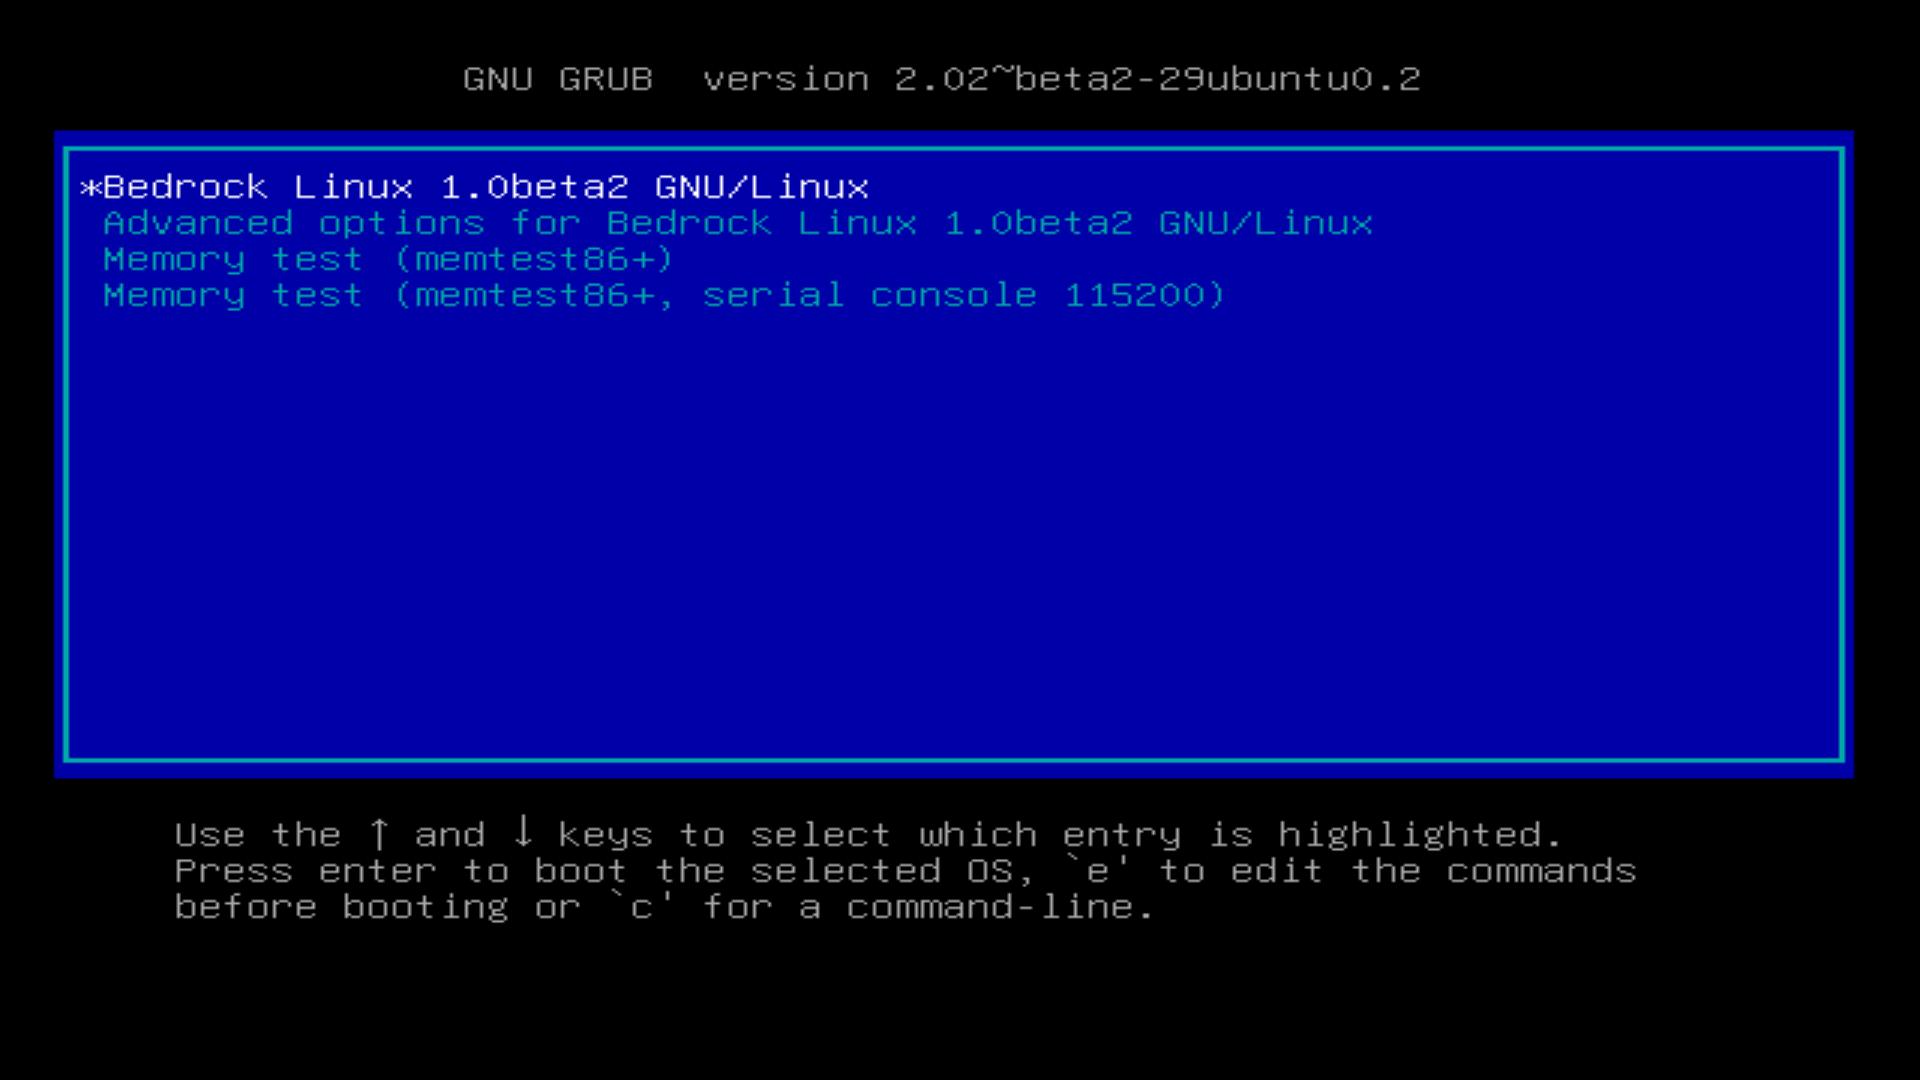 Bedrock Linux 1 0beta2 Nyla Major Features